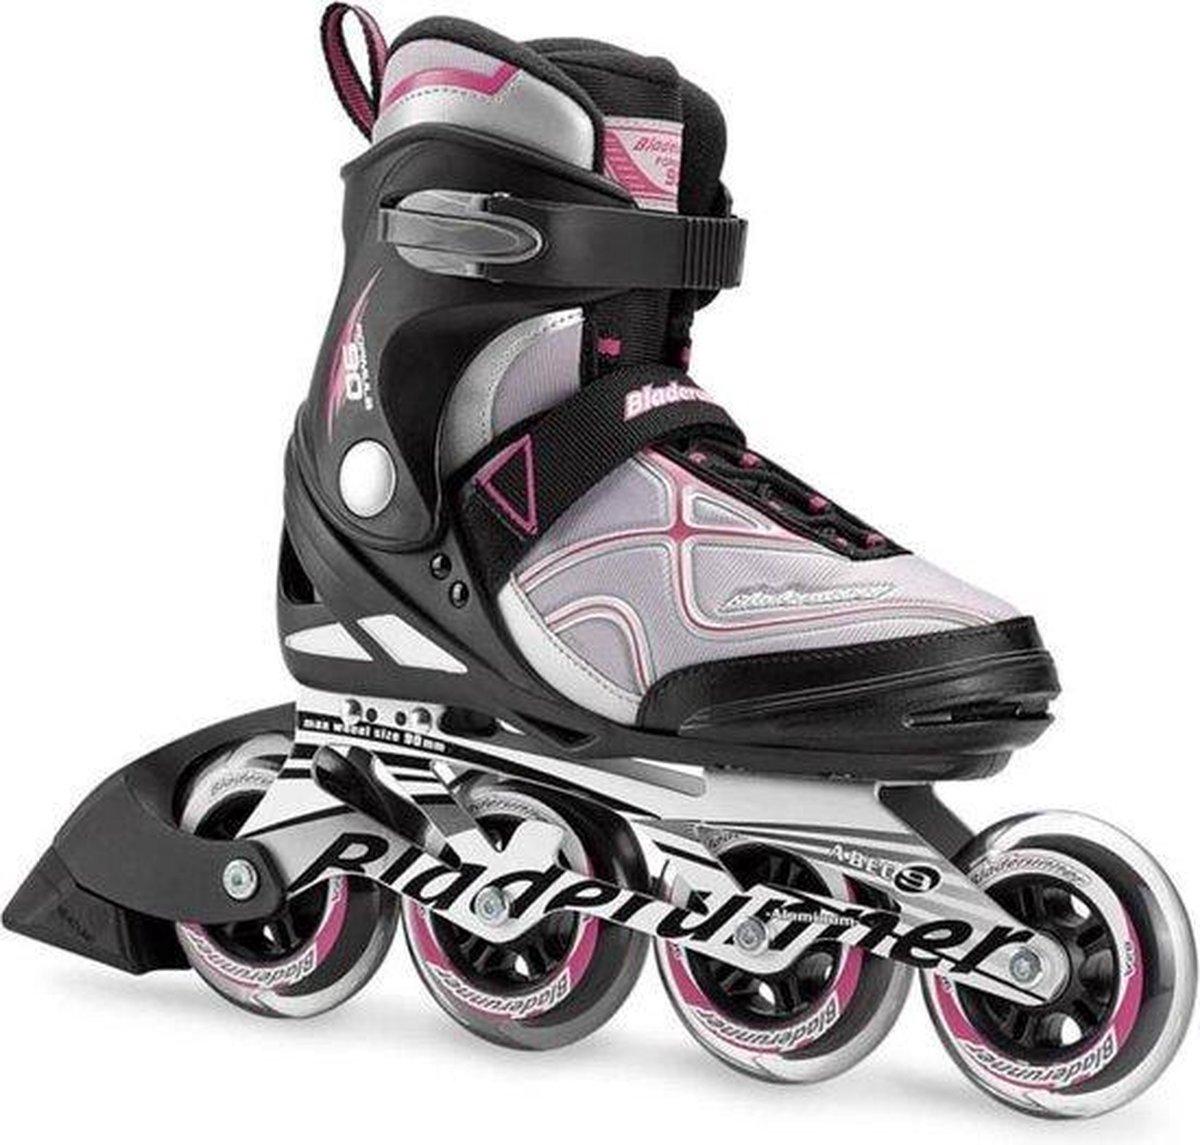 Bladerunner Formula 90 mm - maat 36,5 (US6) - skate dames - zwart paars